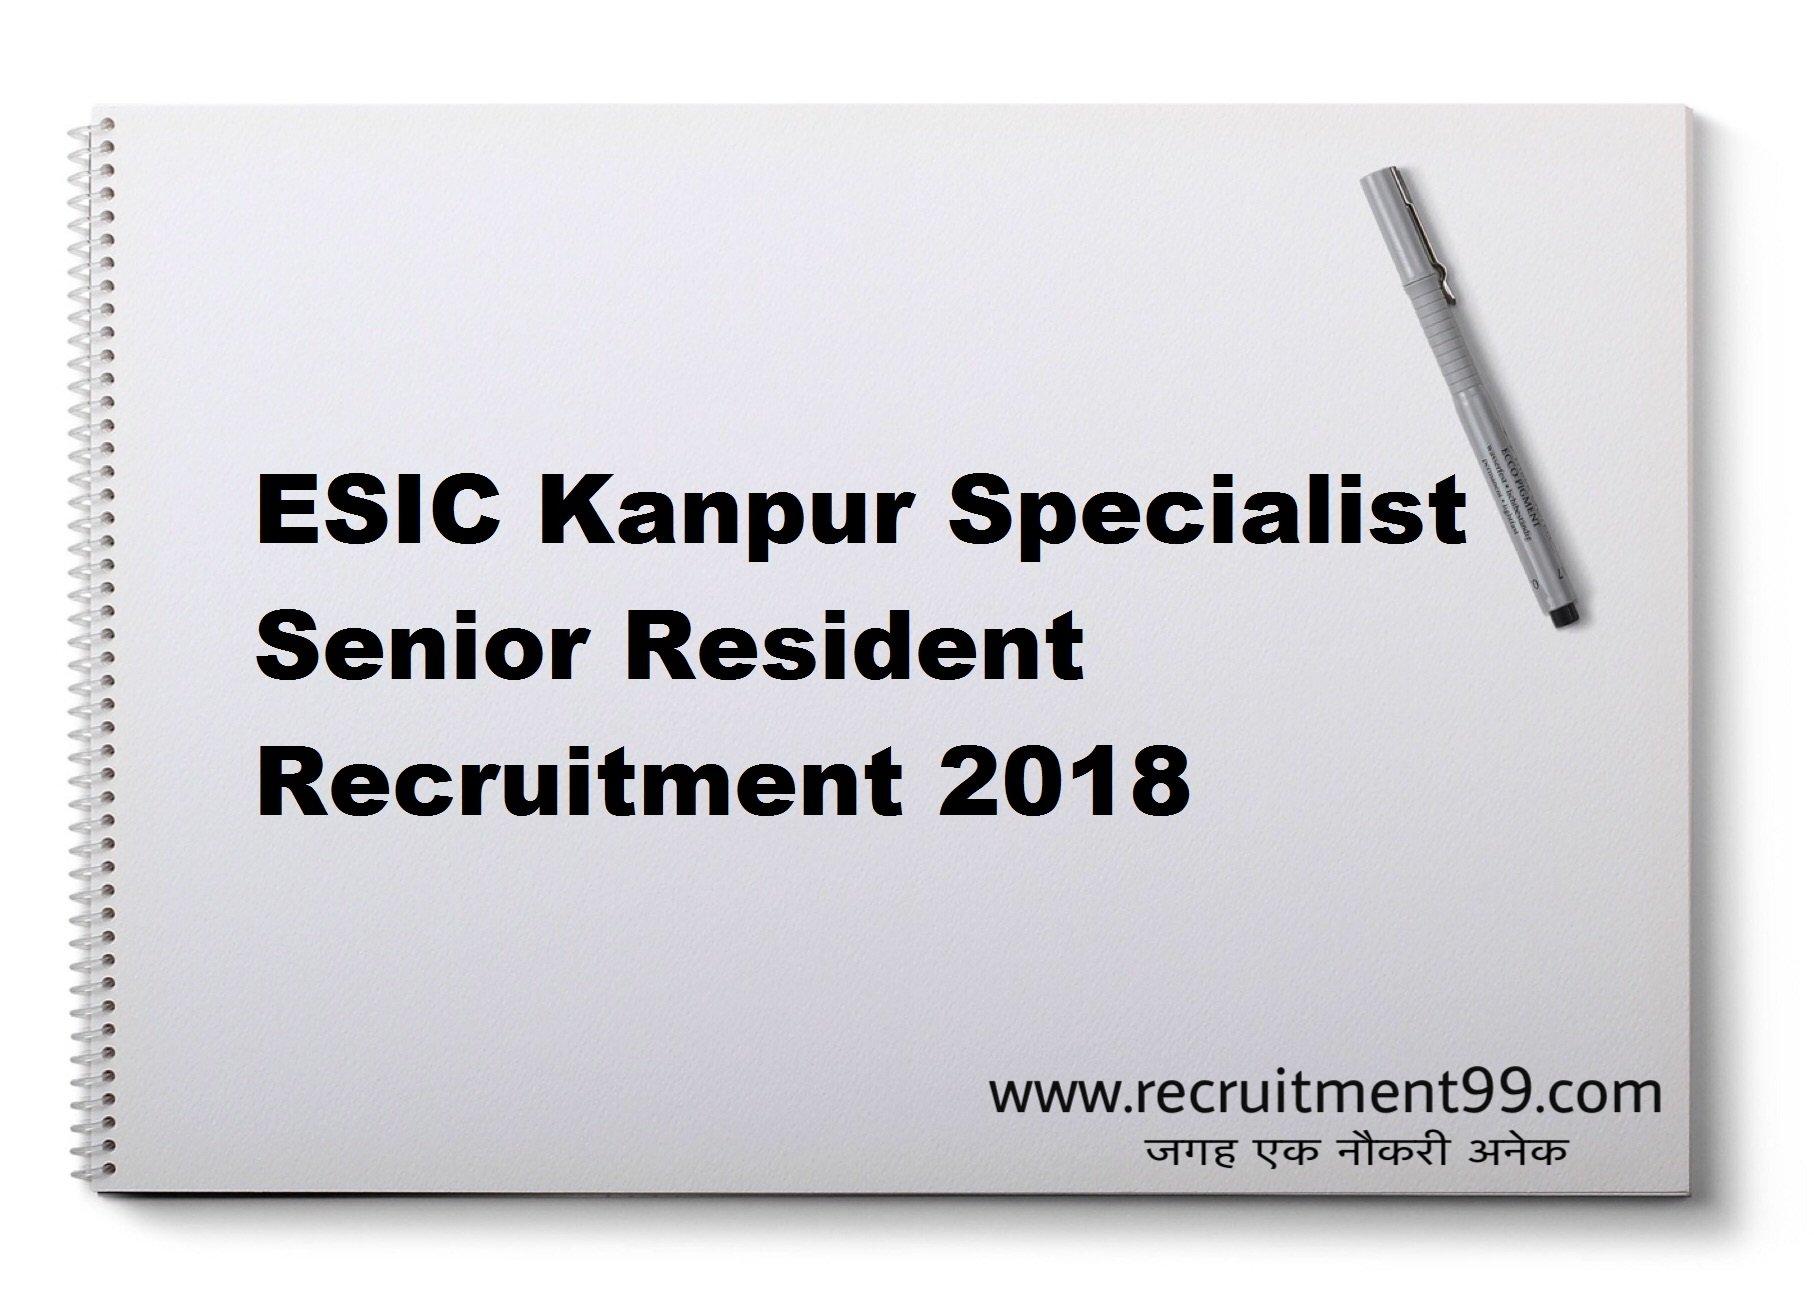 ESIC Kanpur Specialist, Senior Resident Recruitment Admit Card Result 2018